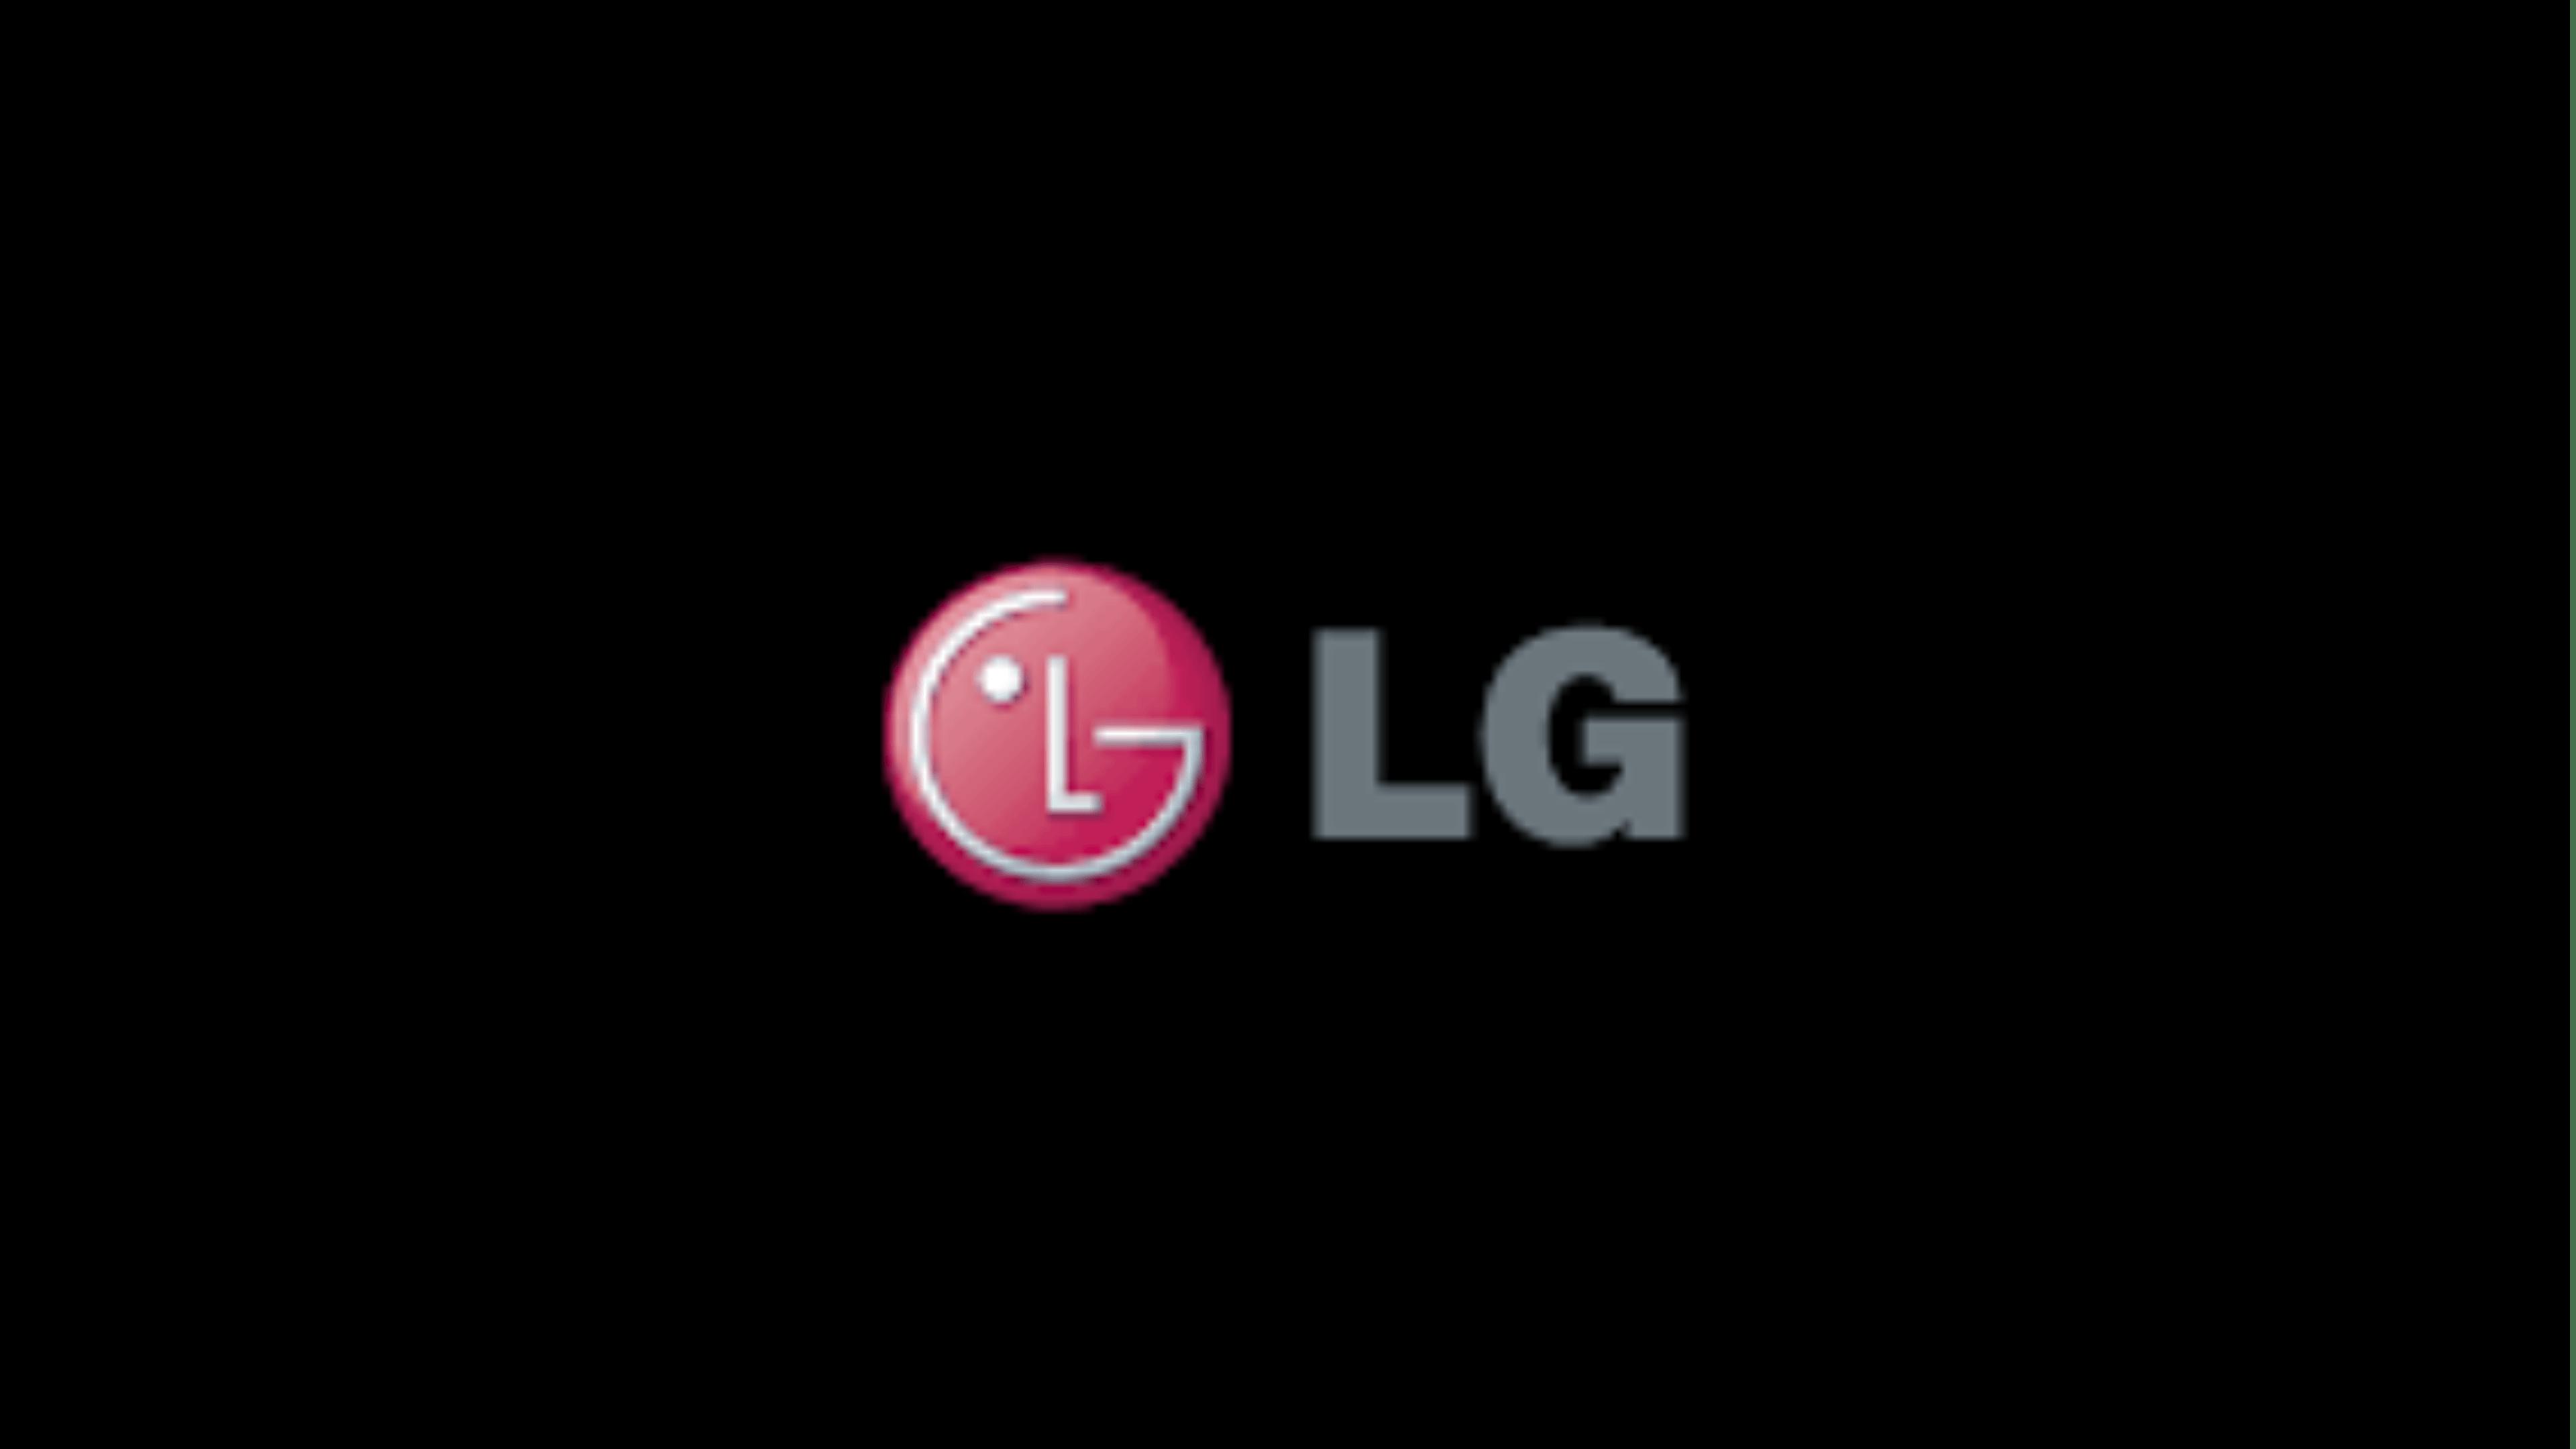 LG TV Logo Wallpapers - Top Free LG TV